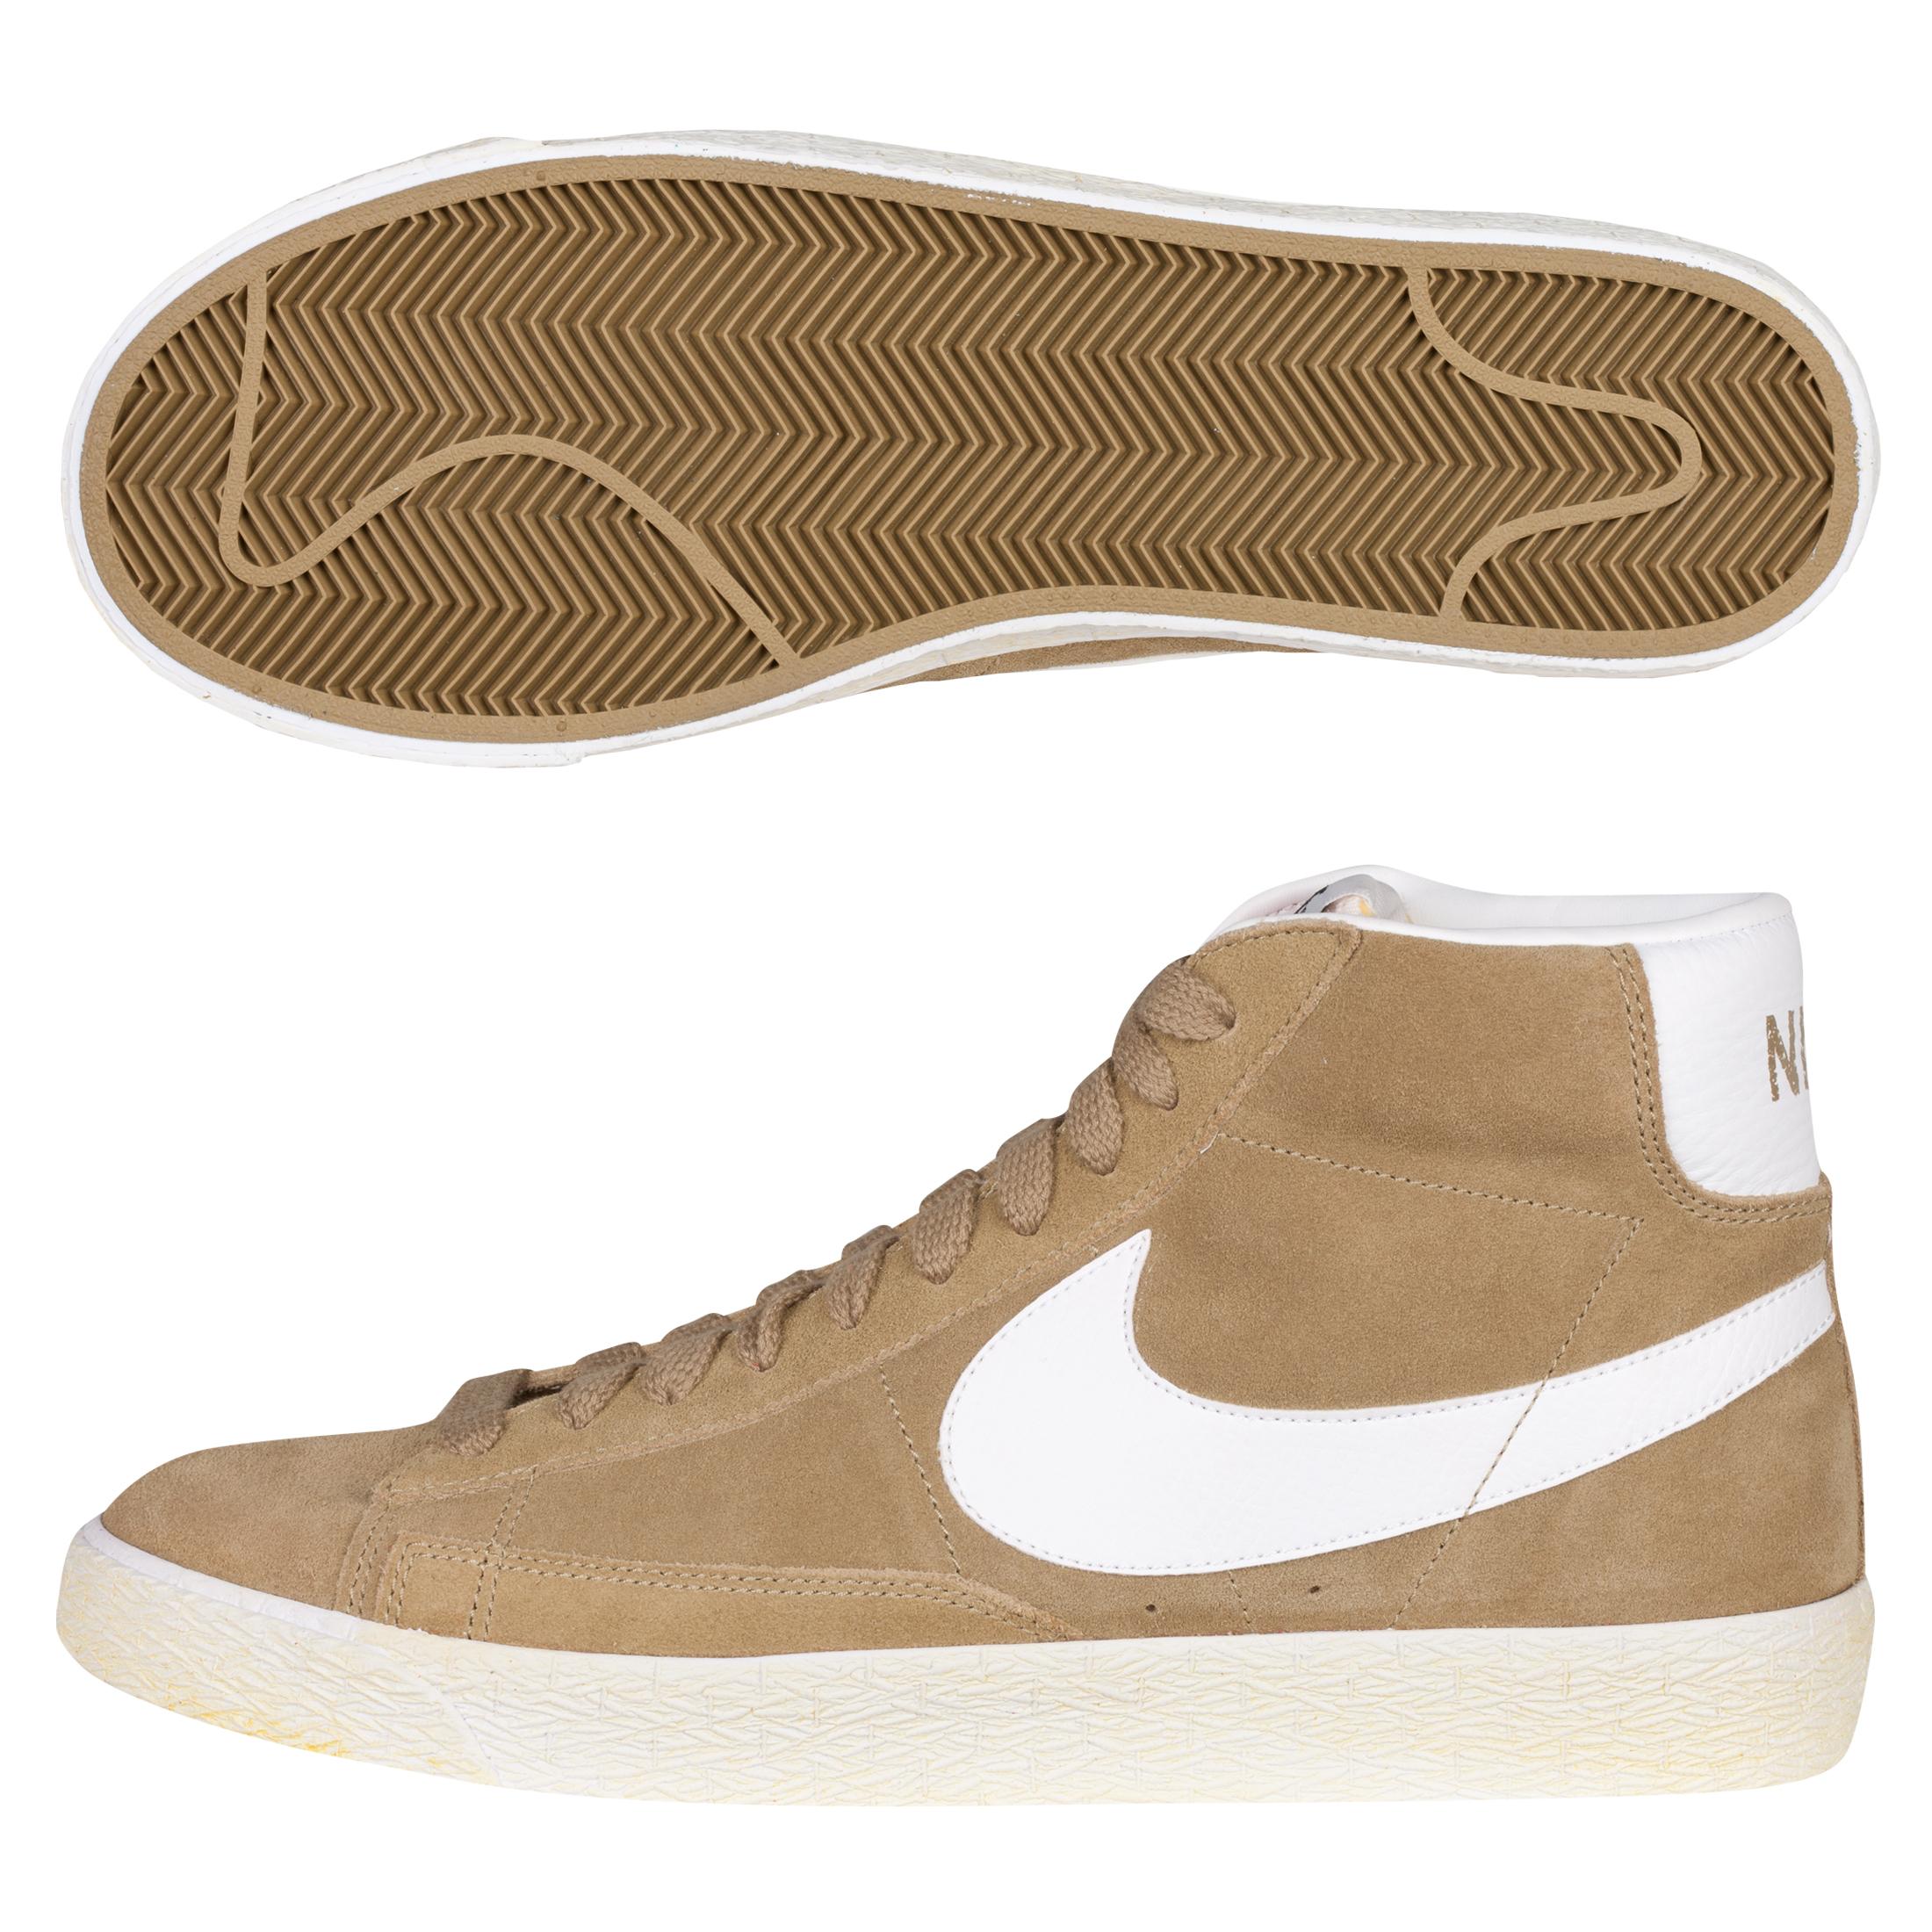 Nike Blazer Mid Trainers - Filbert/White